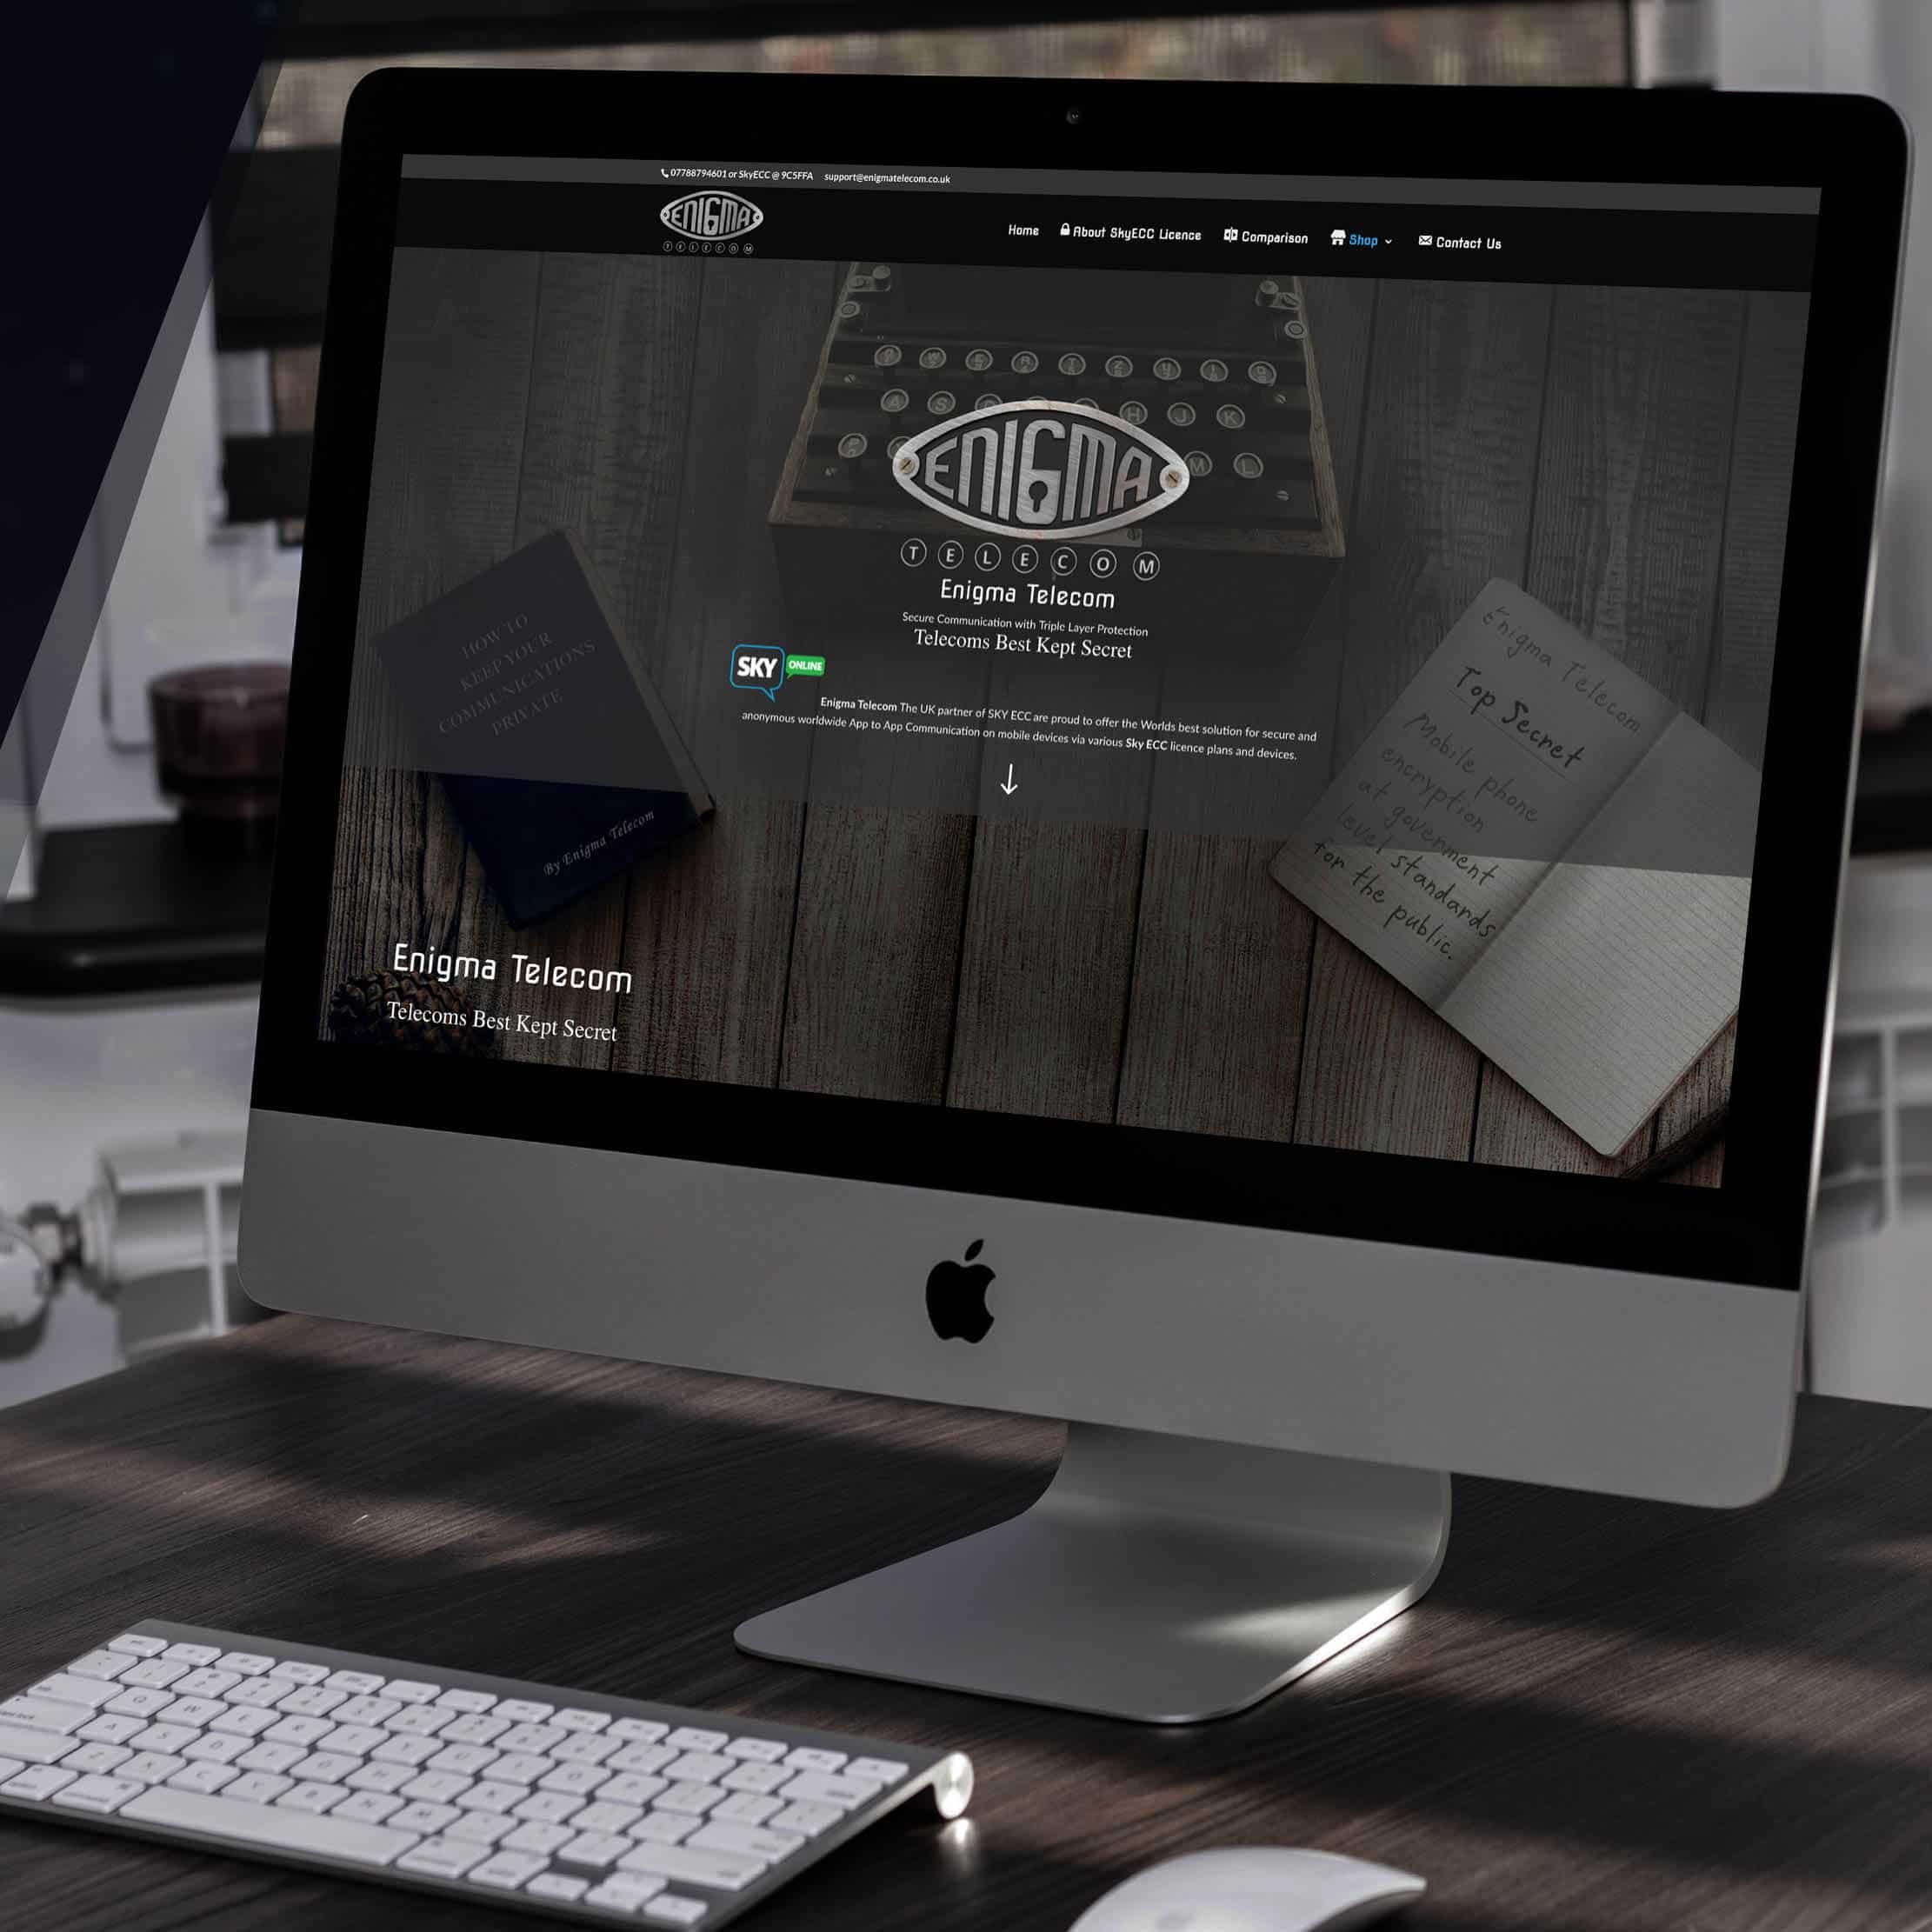 Enigma Telecom website on computer